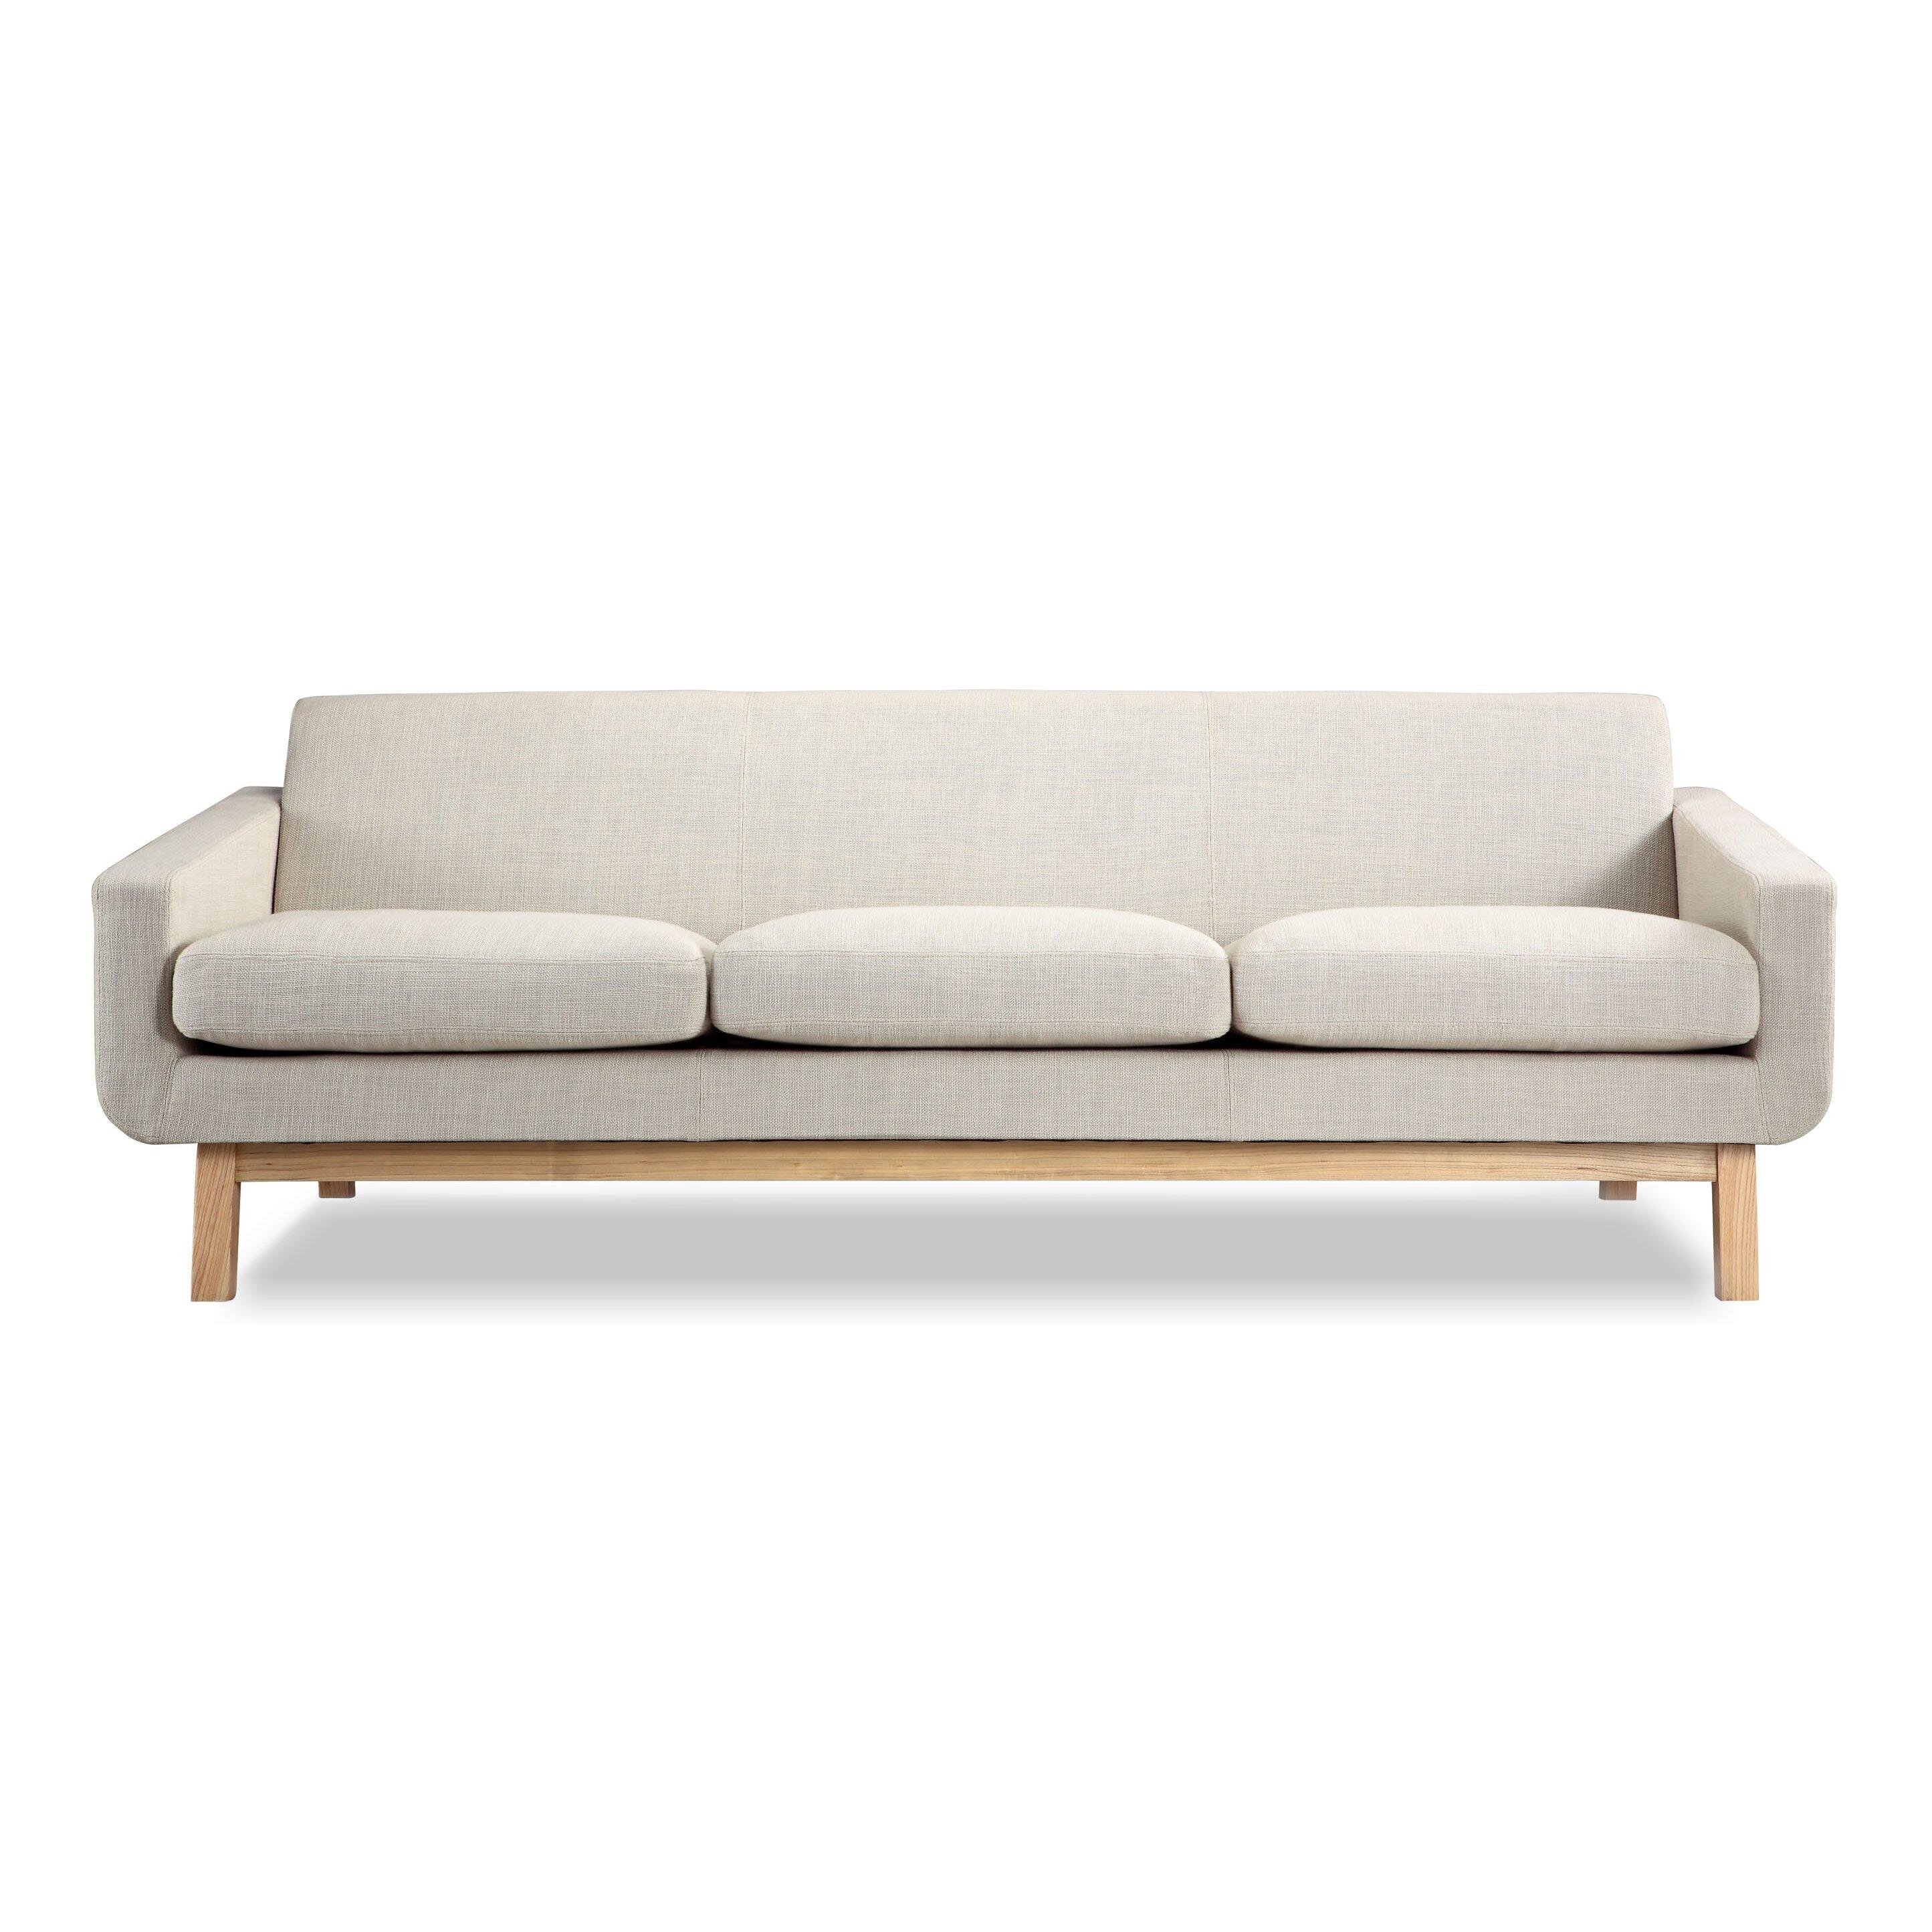 Kardiel platform mid century modern classic sofa reviews for Classic sofa